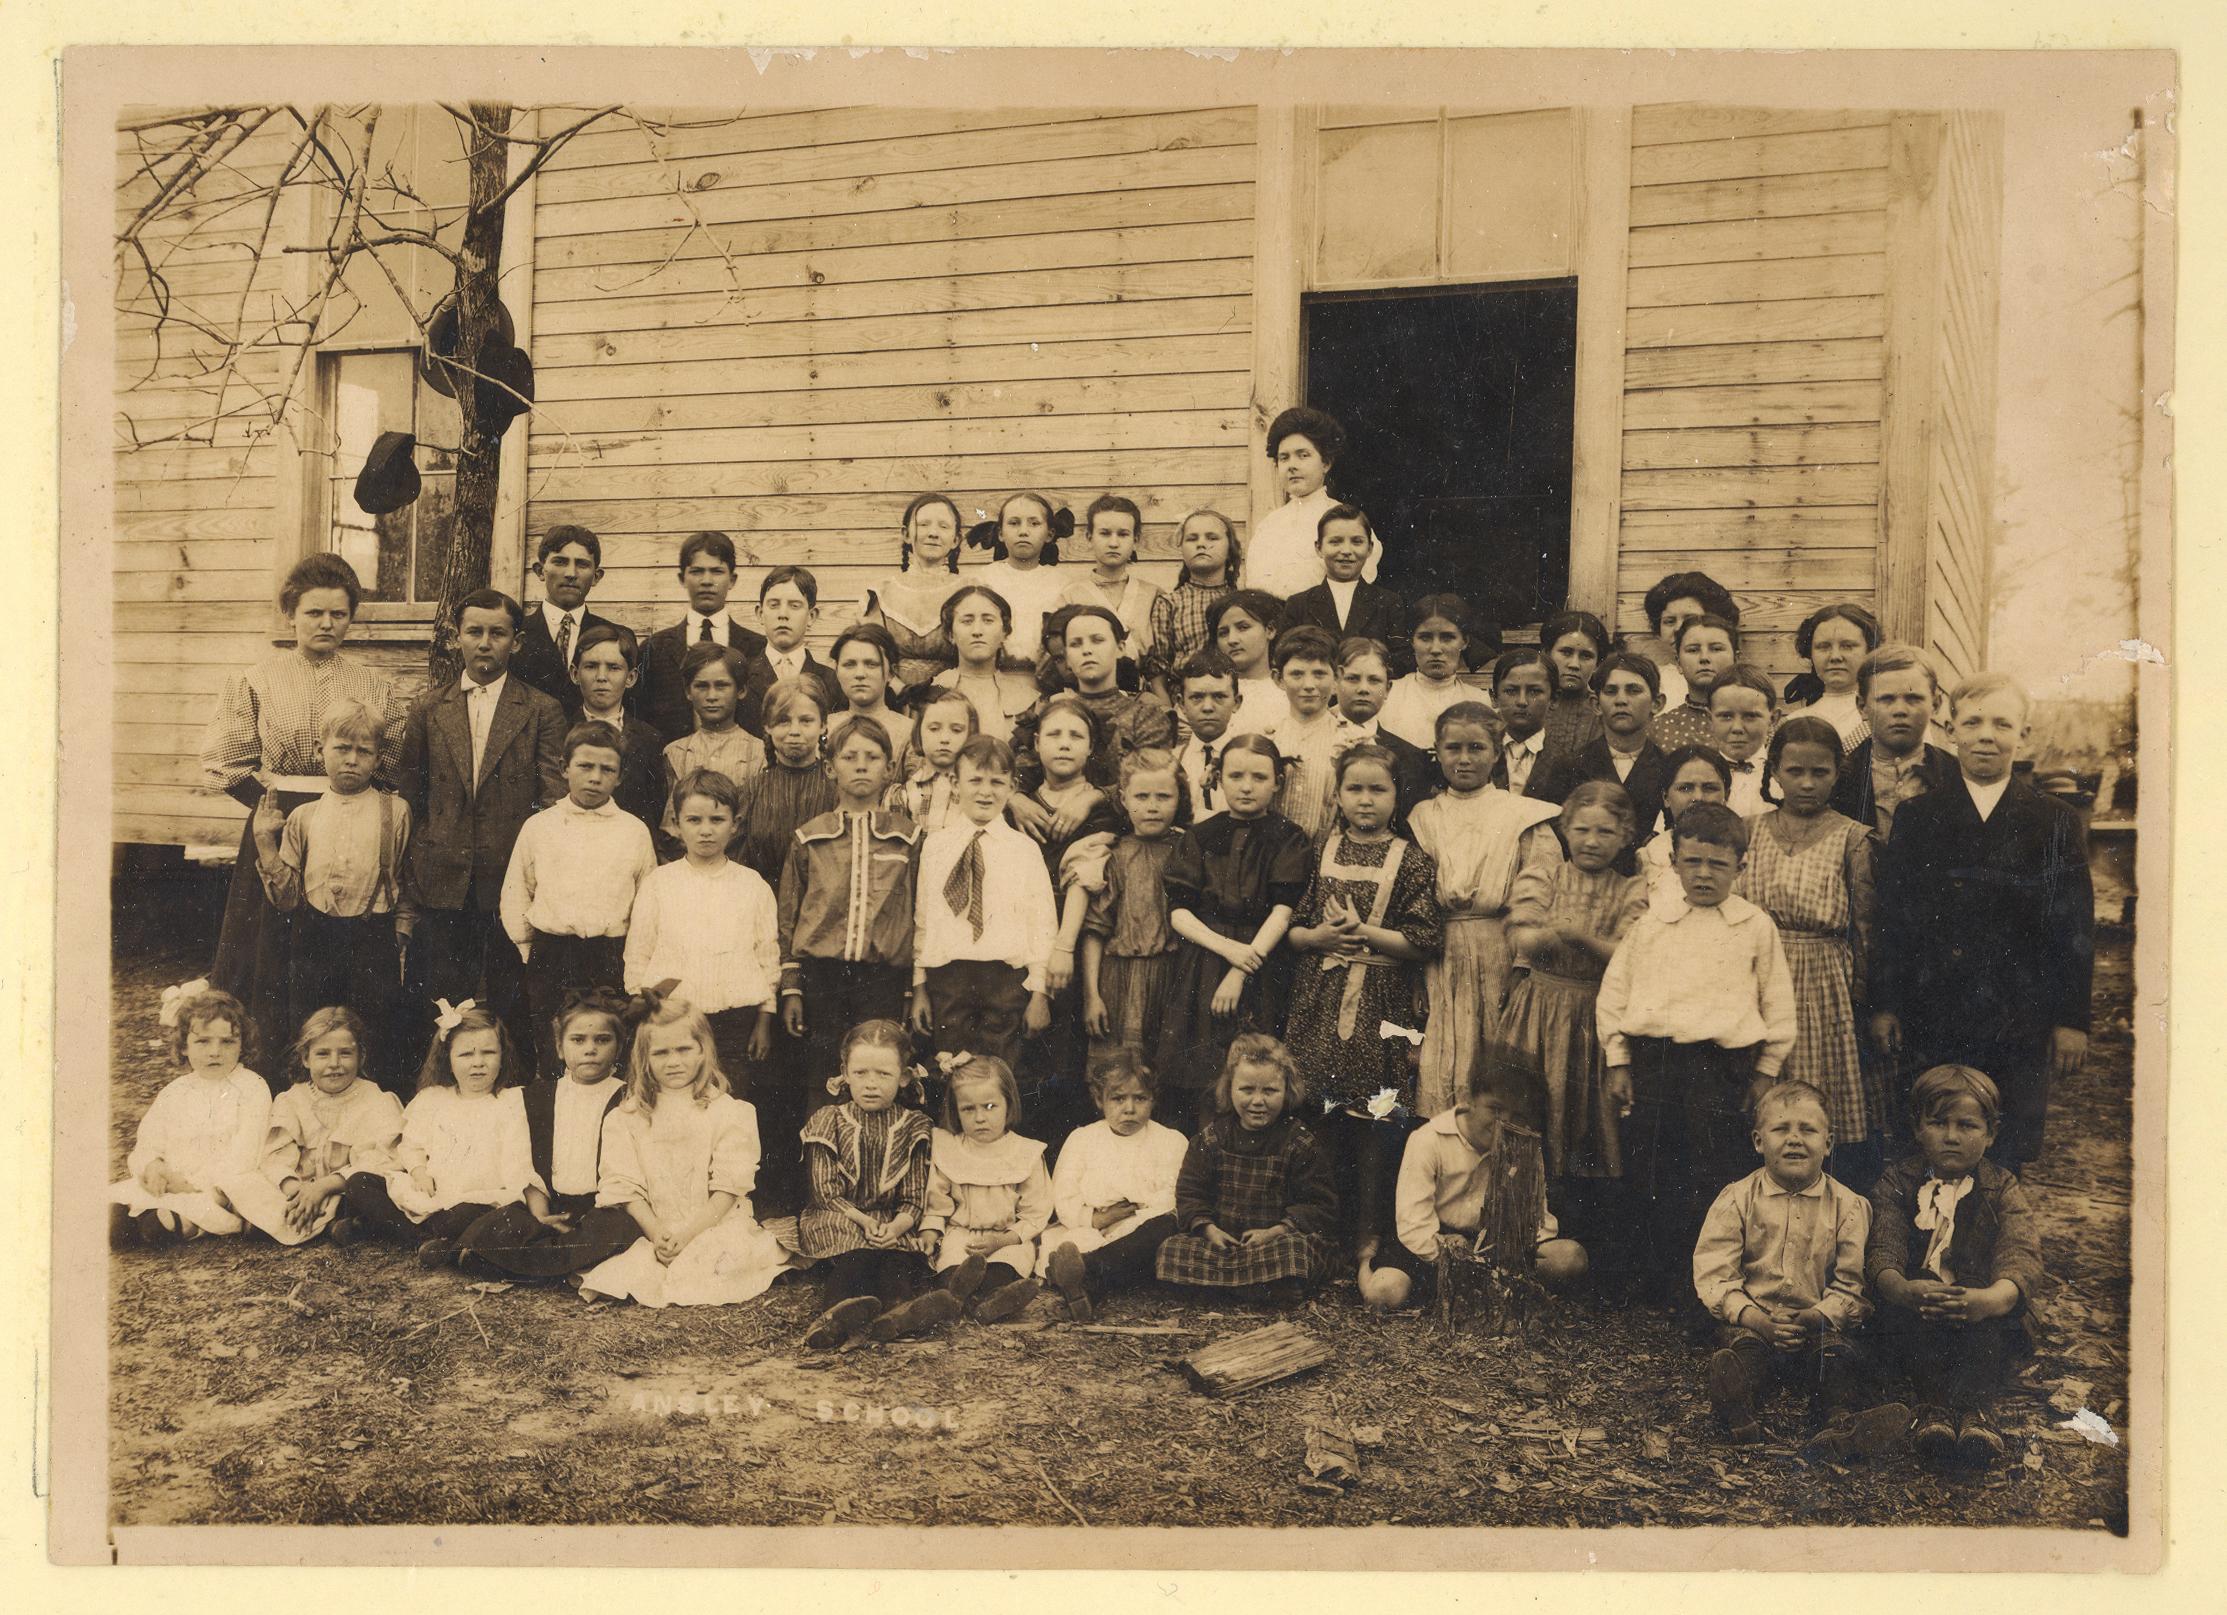 Ansley School (1903)